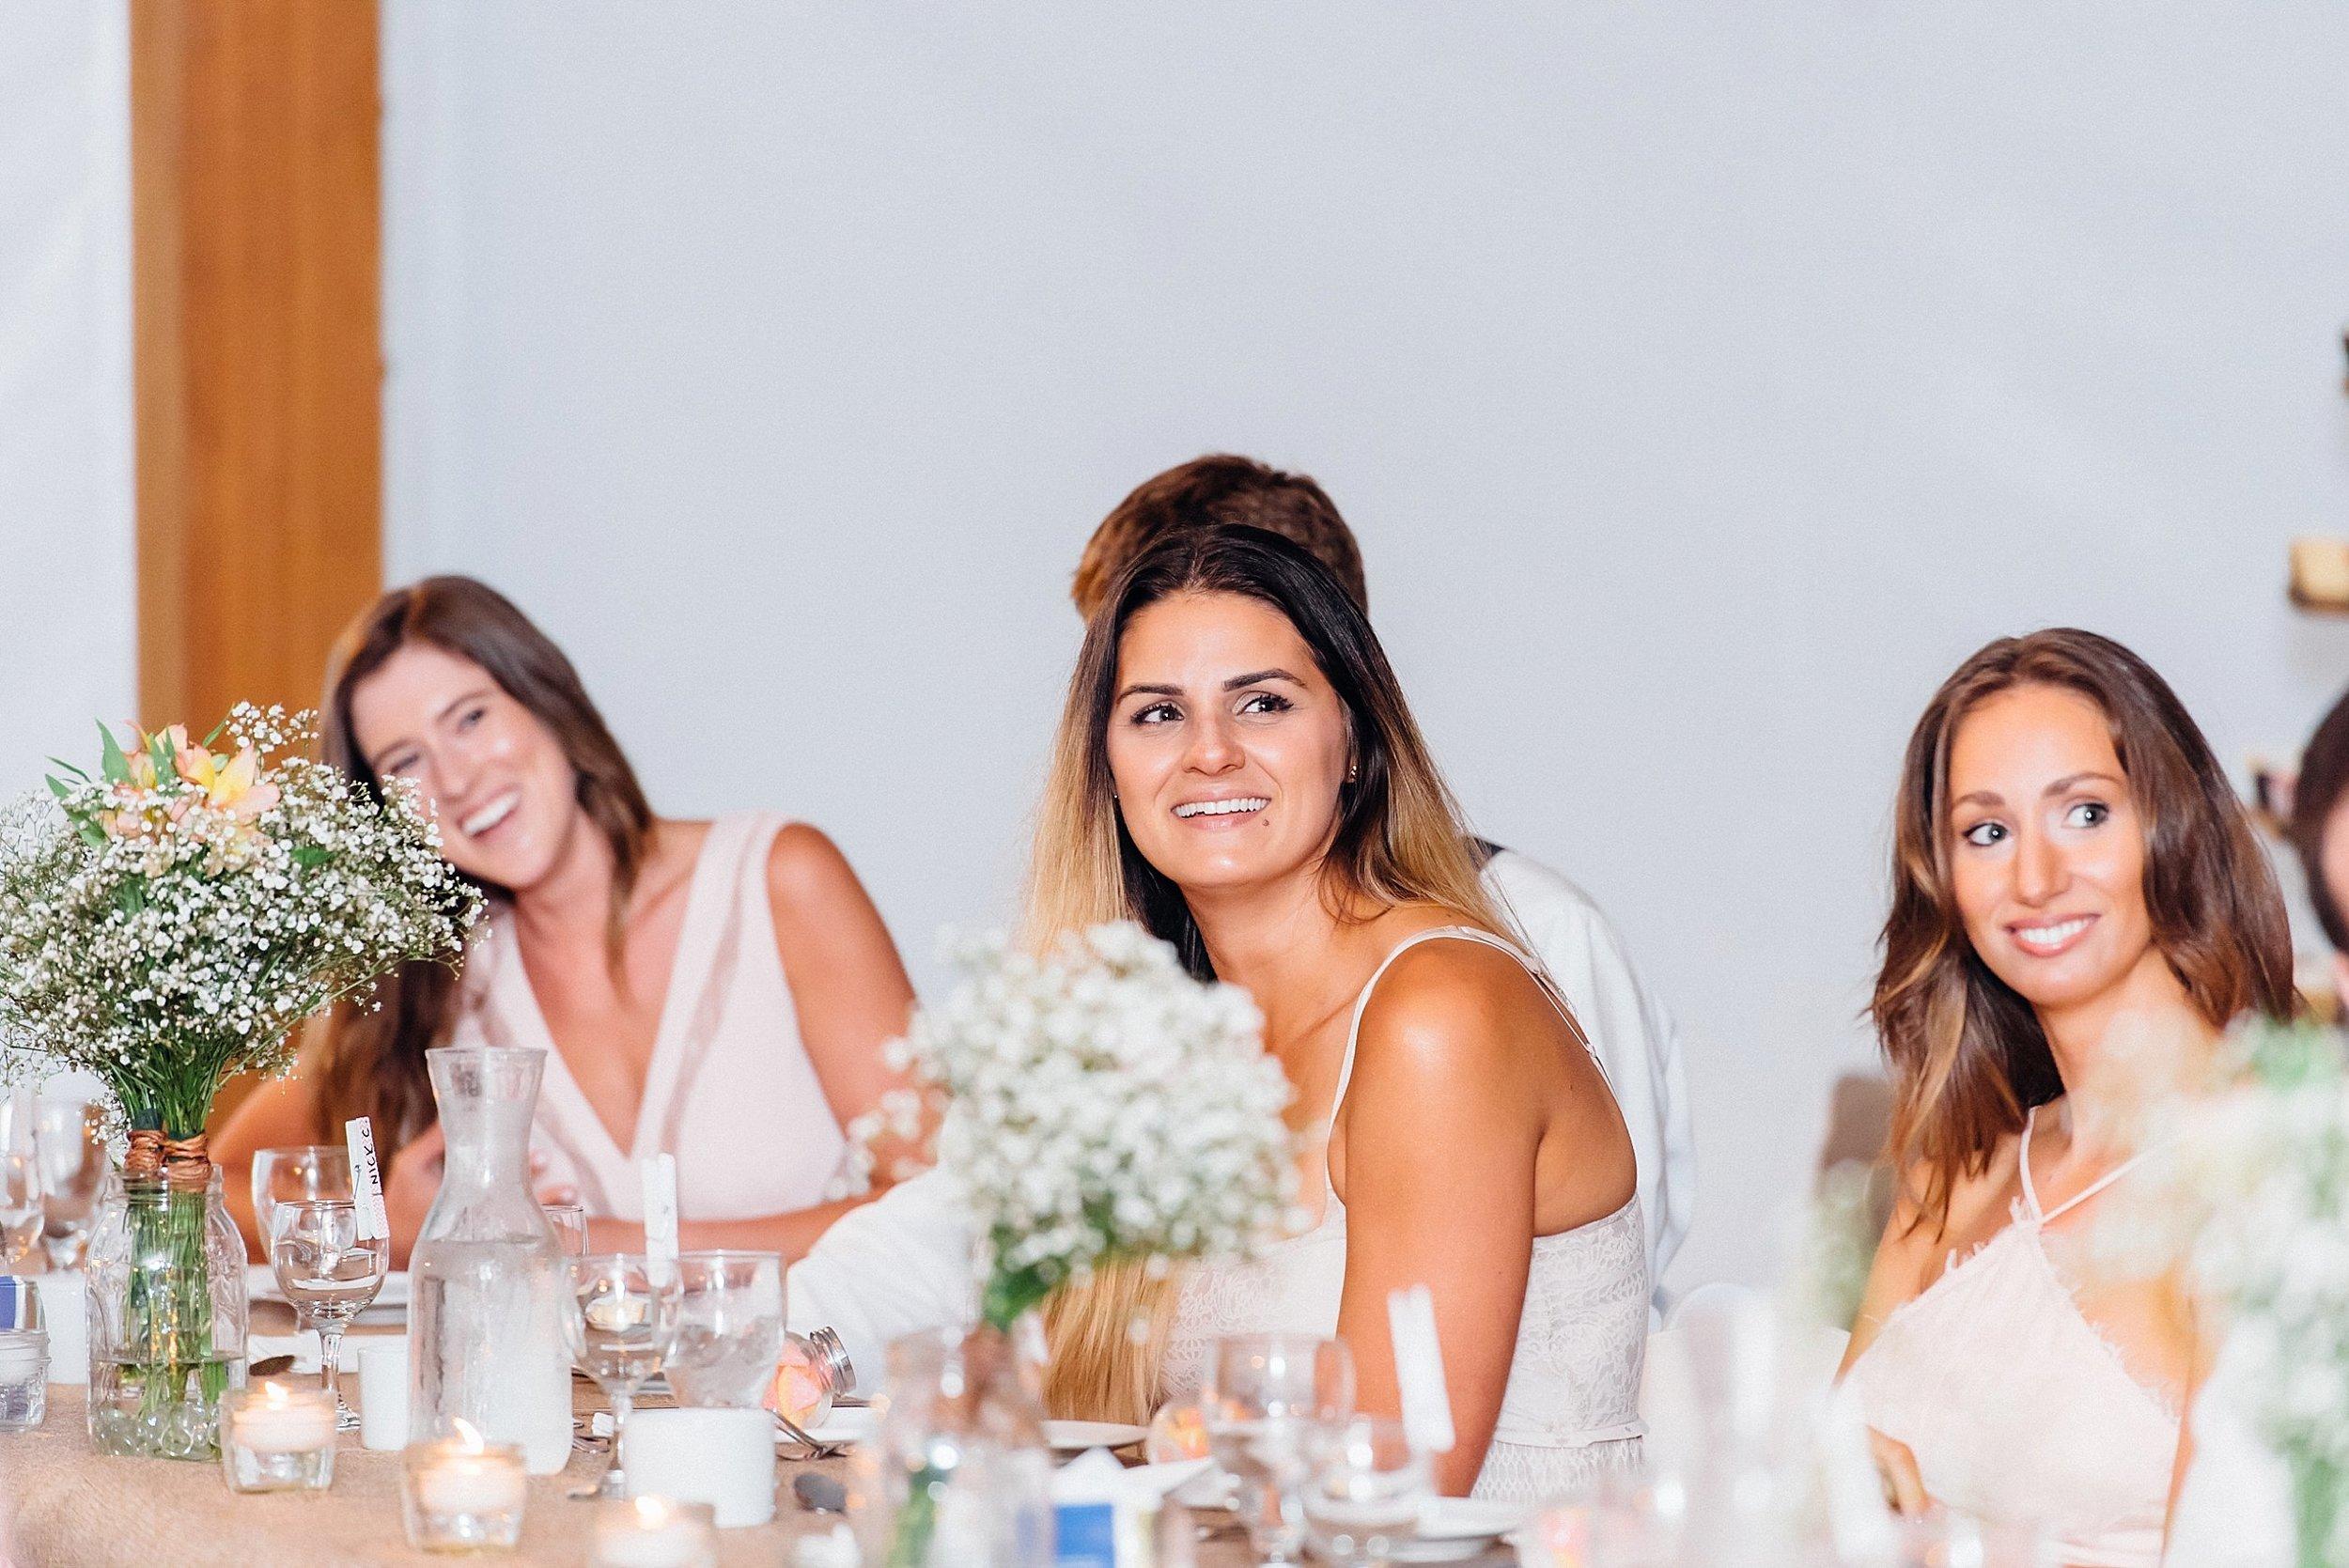 Ottawa Wedding Photographer - Stanley's Olde Maple Lane Barn Wedding - Ali & Batoul Photography_0070.jpg